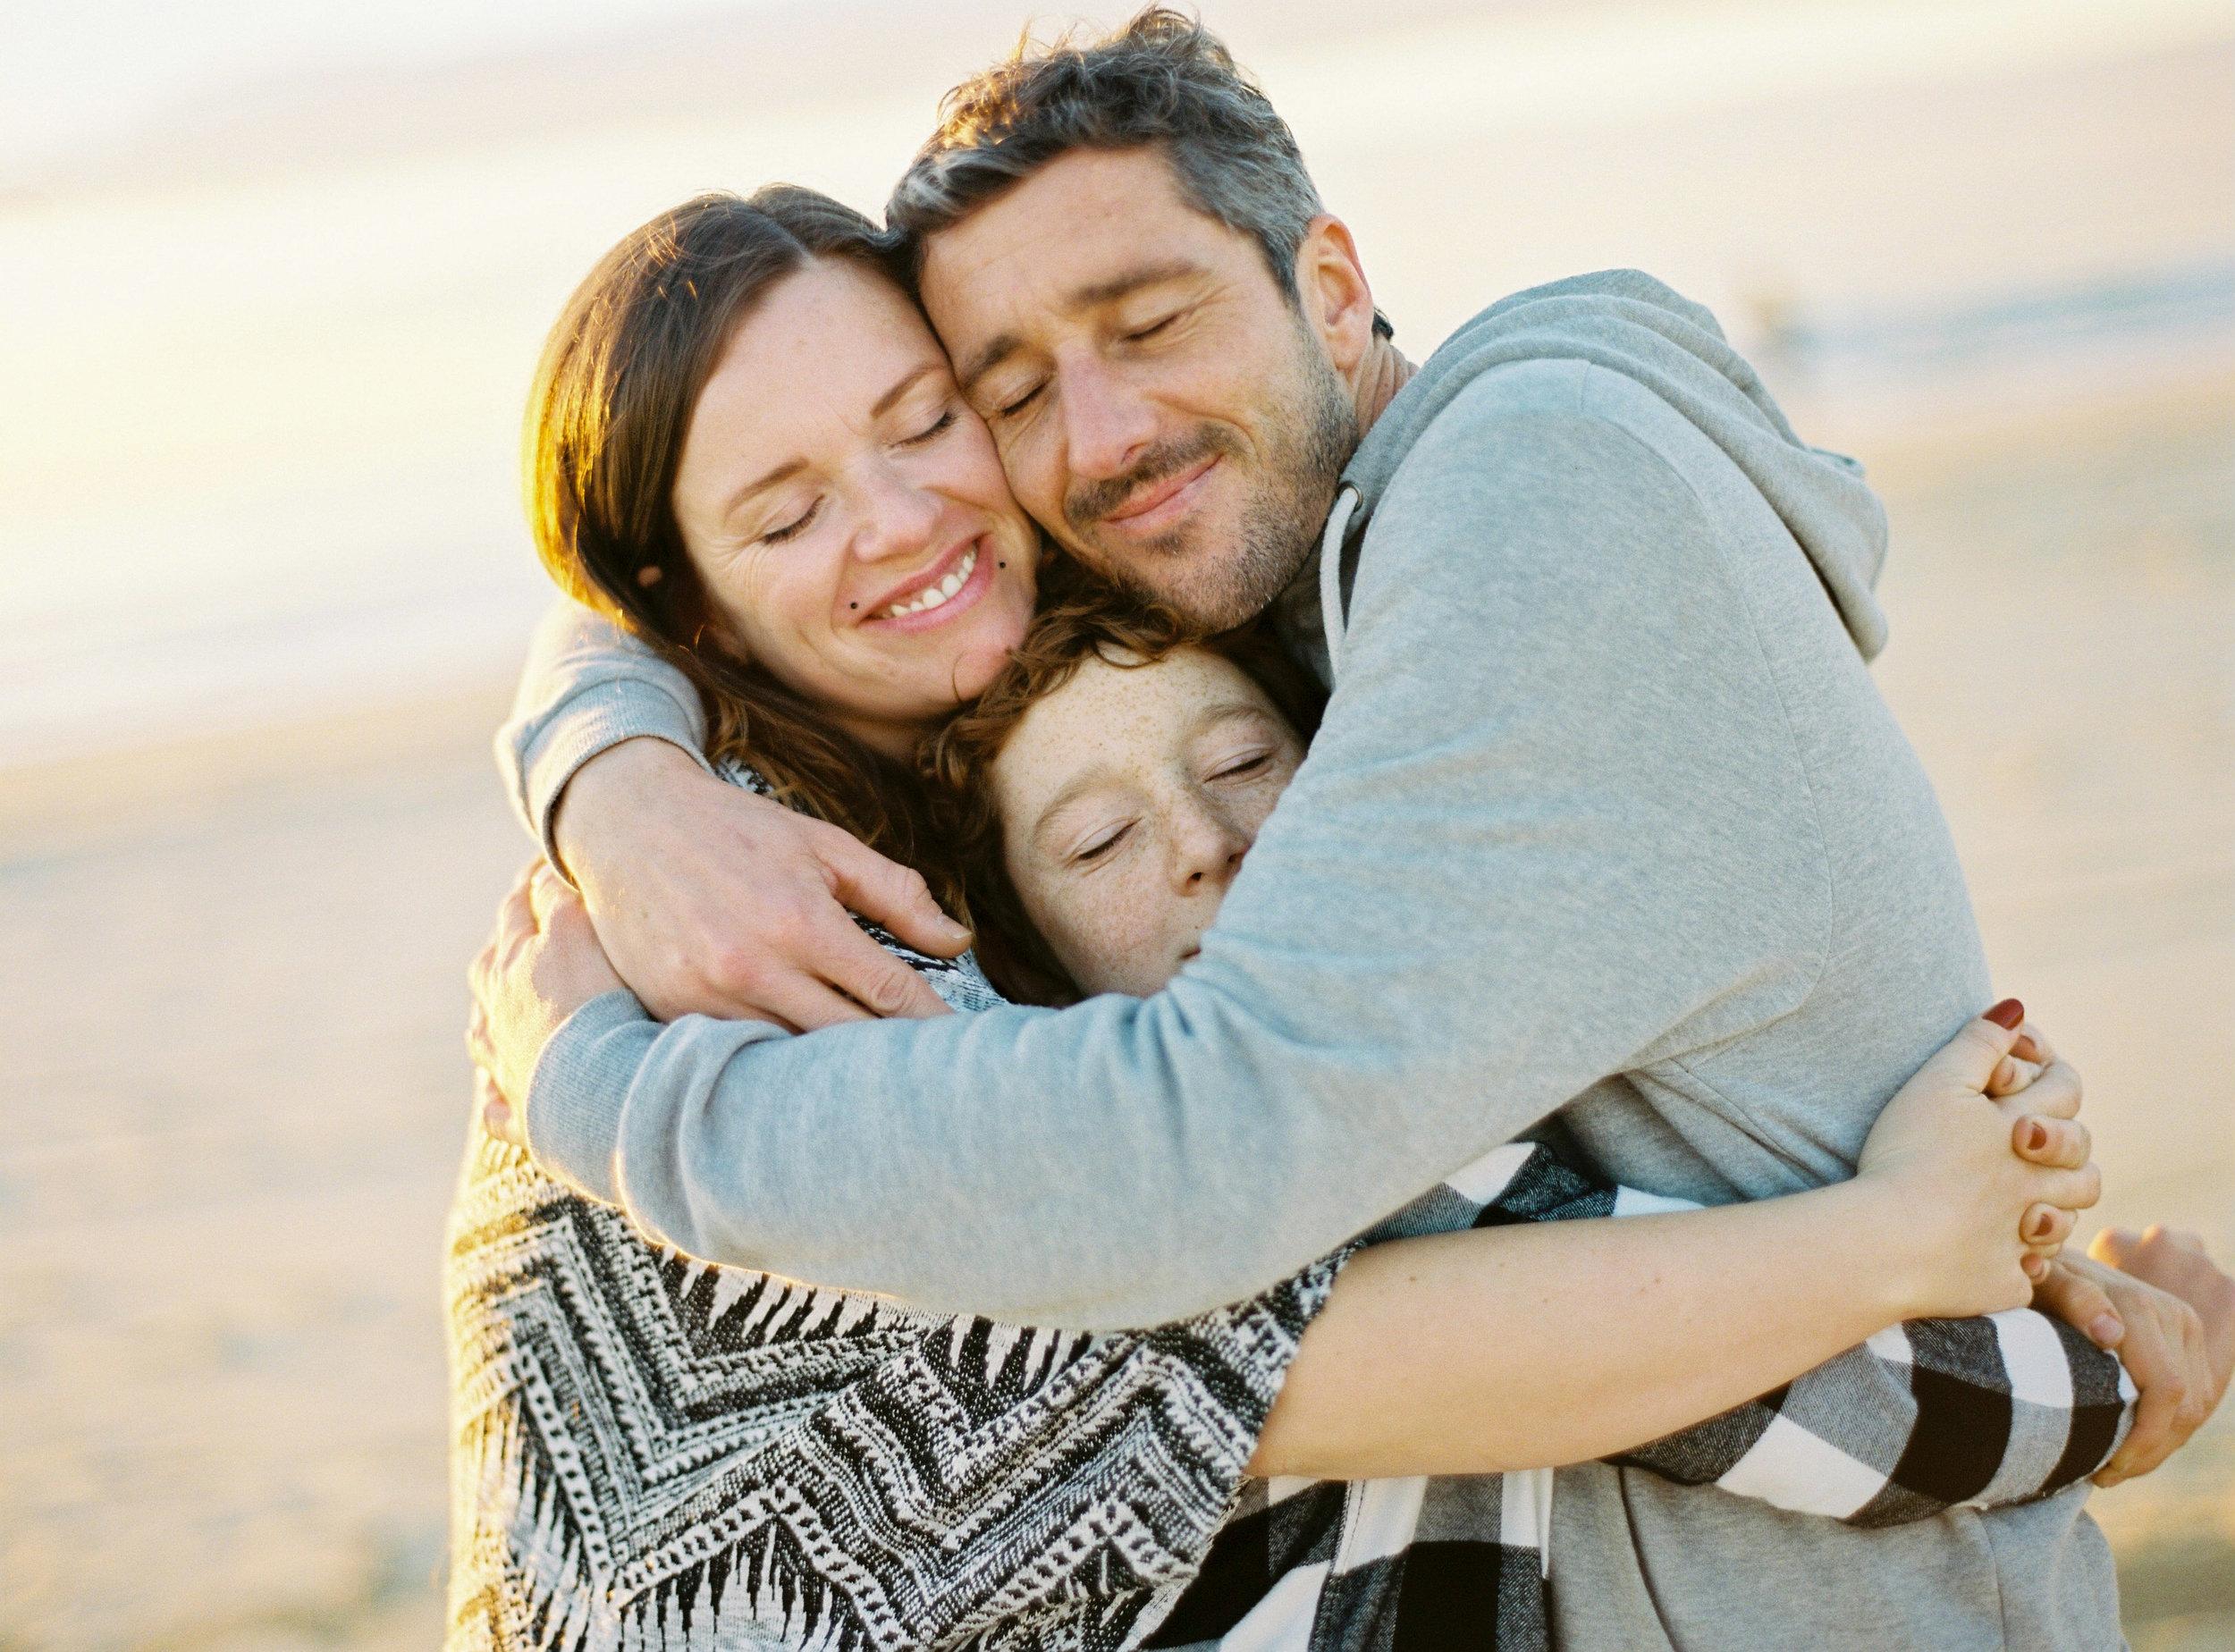 ccelinehamelin-photographe-couple-landes-session-plage-lovers-photography-photographe-seignosse-argentique-onfilm10.jpg